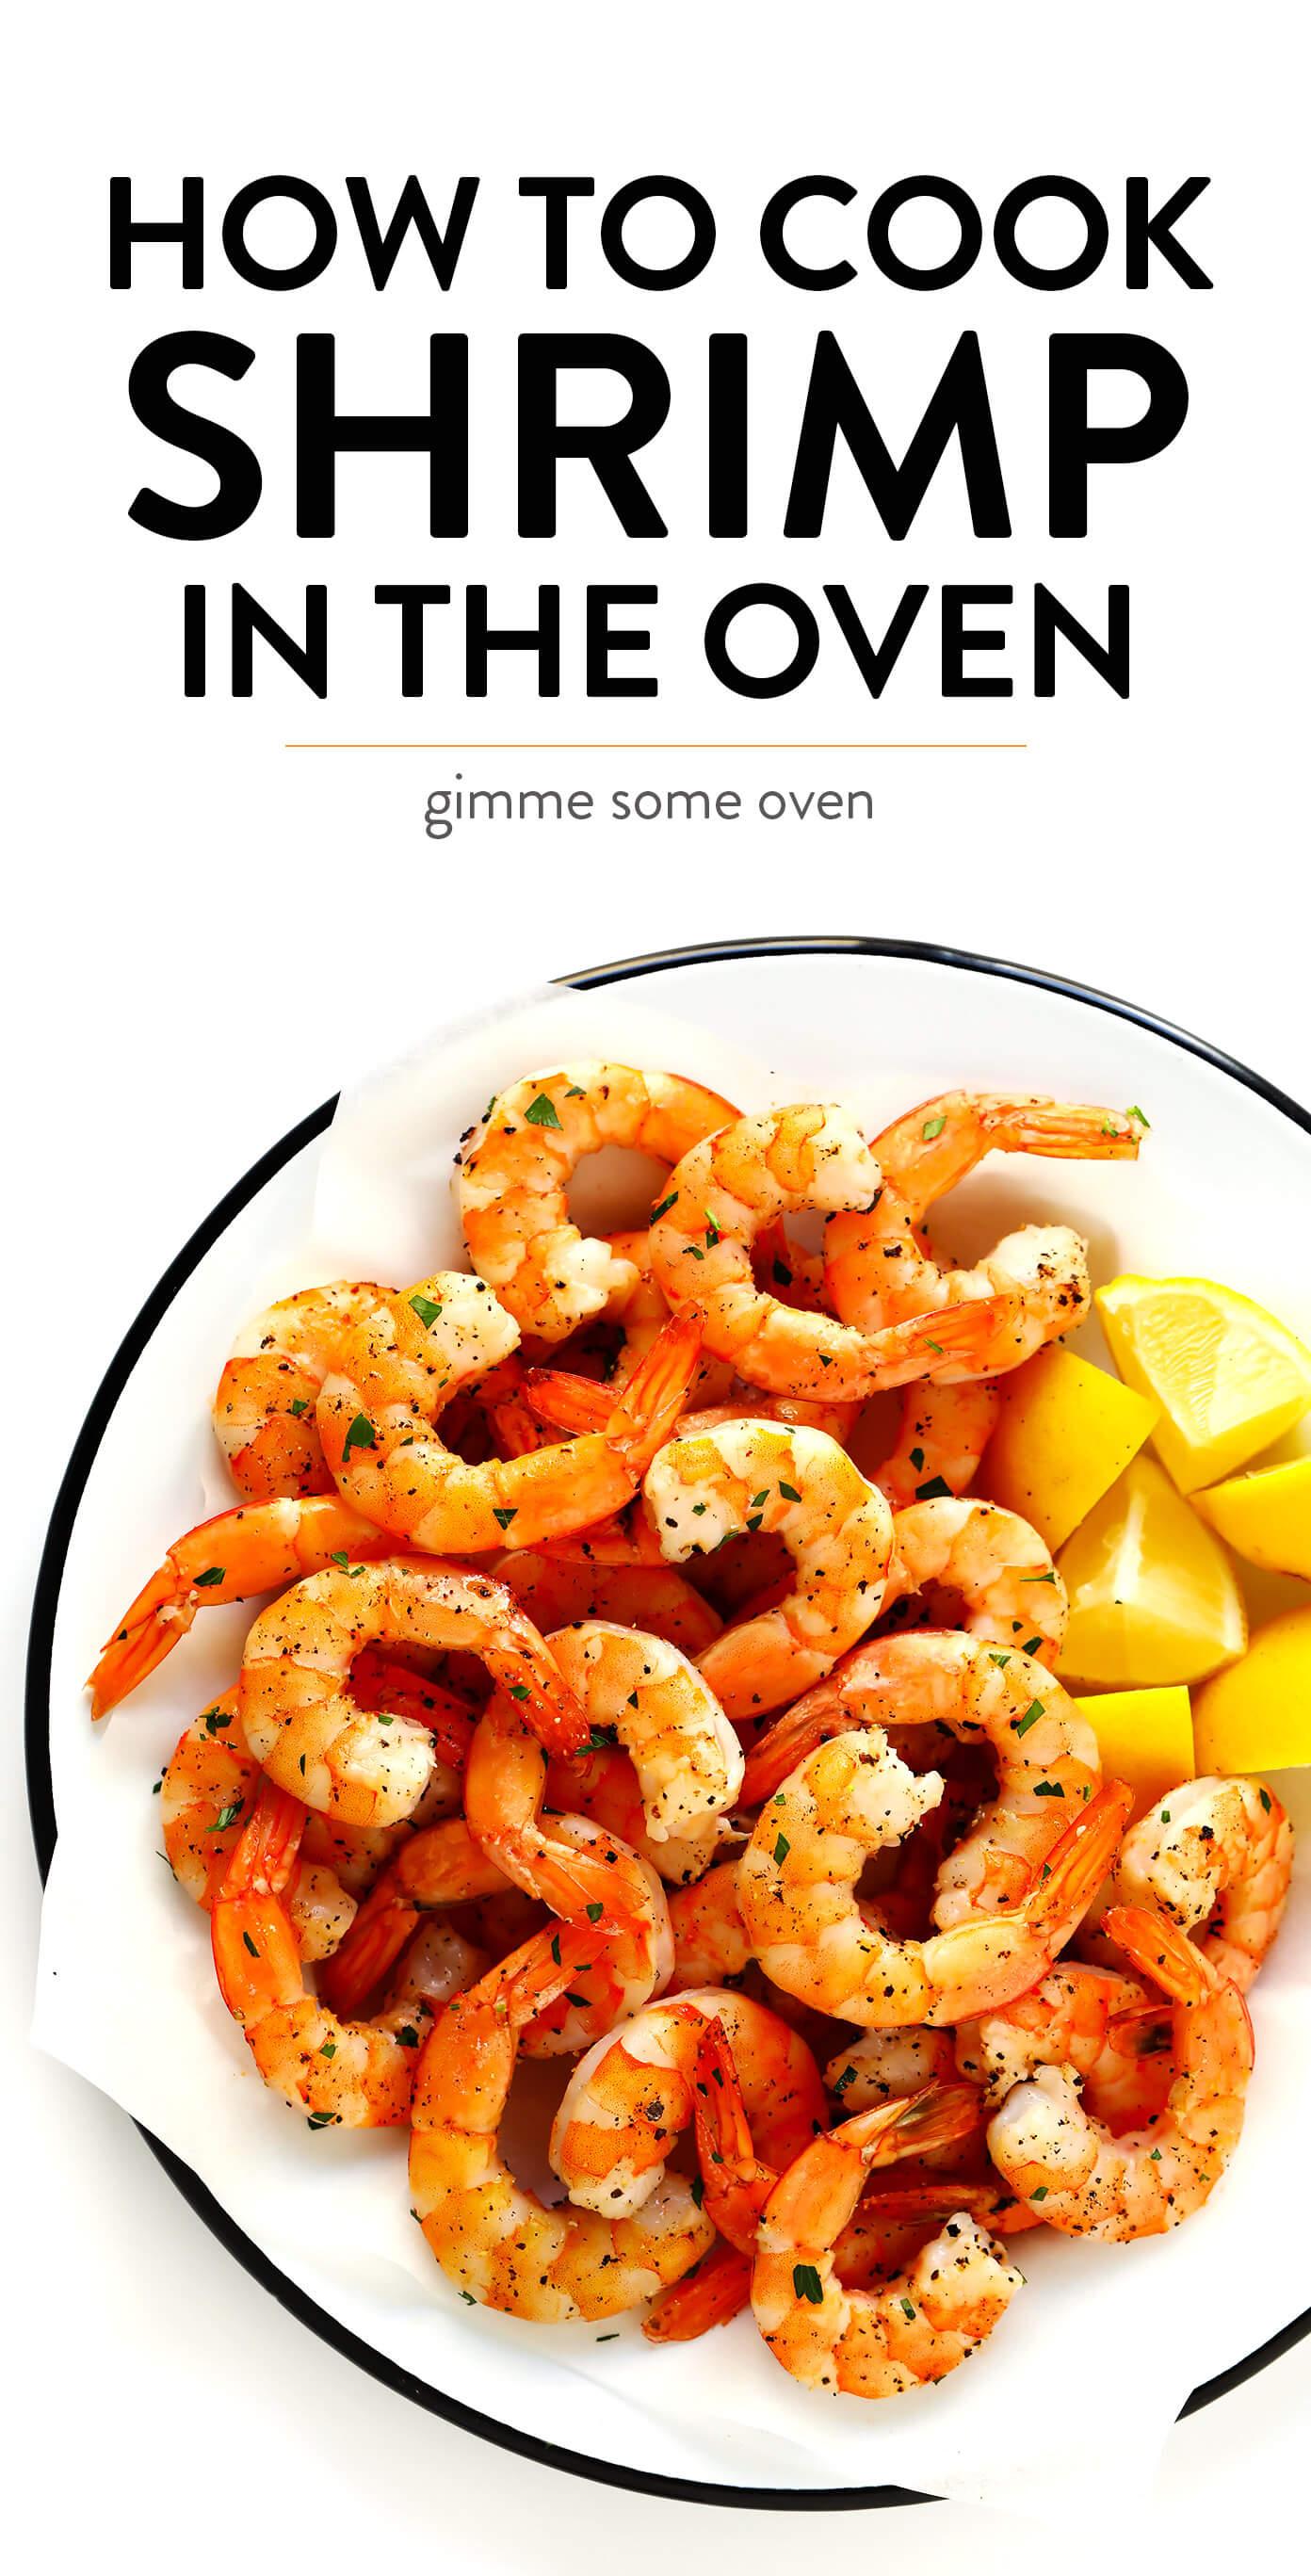 Shrimp dating method